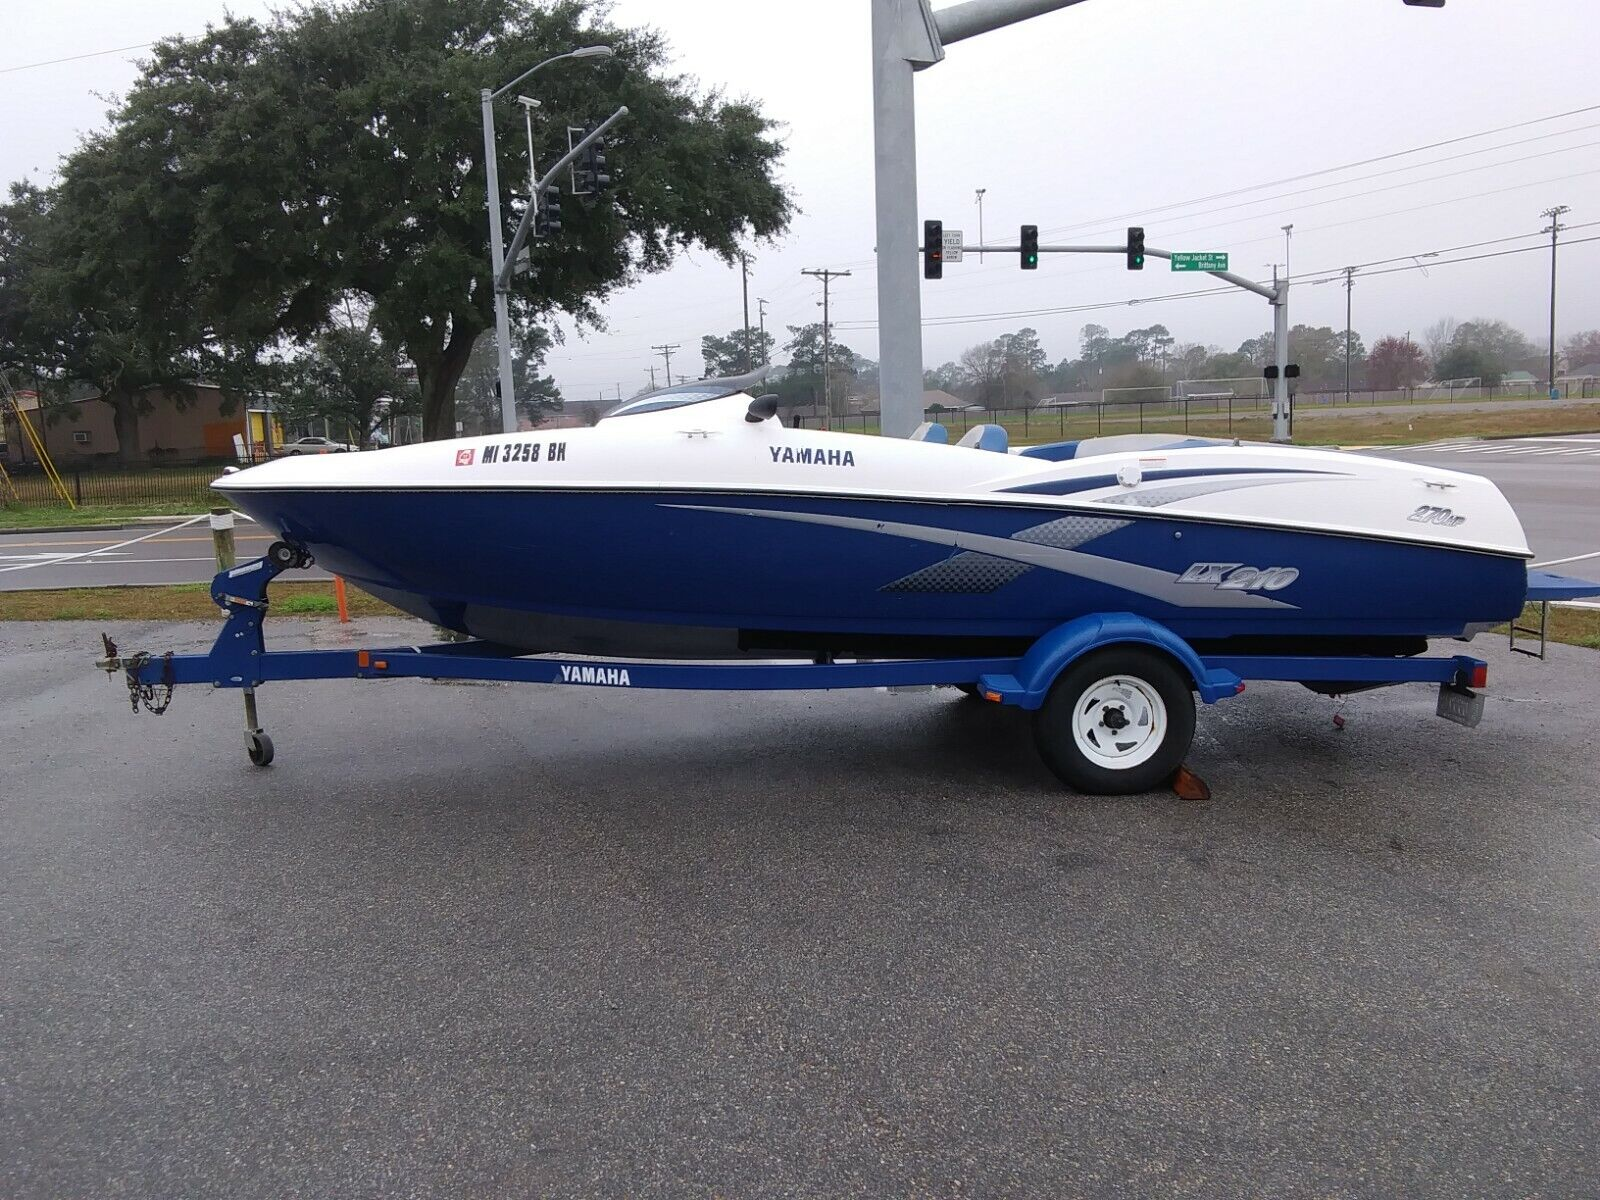 2003 Yamaha LX210 Twin Engine Running Jet Boat With Trailer & Swim Platform